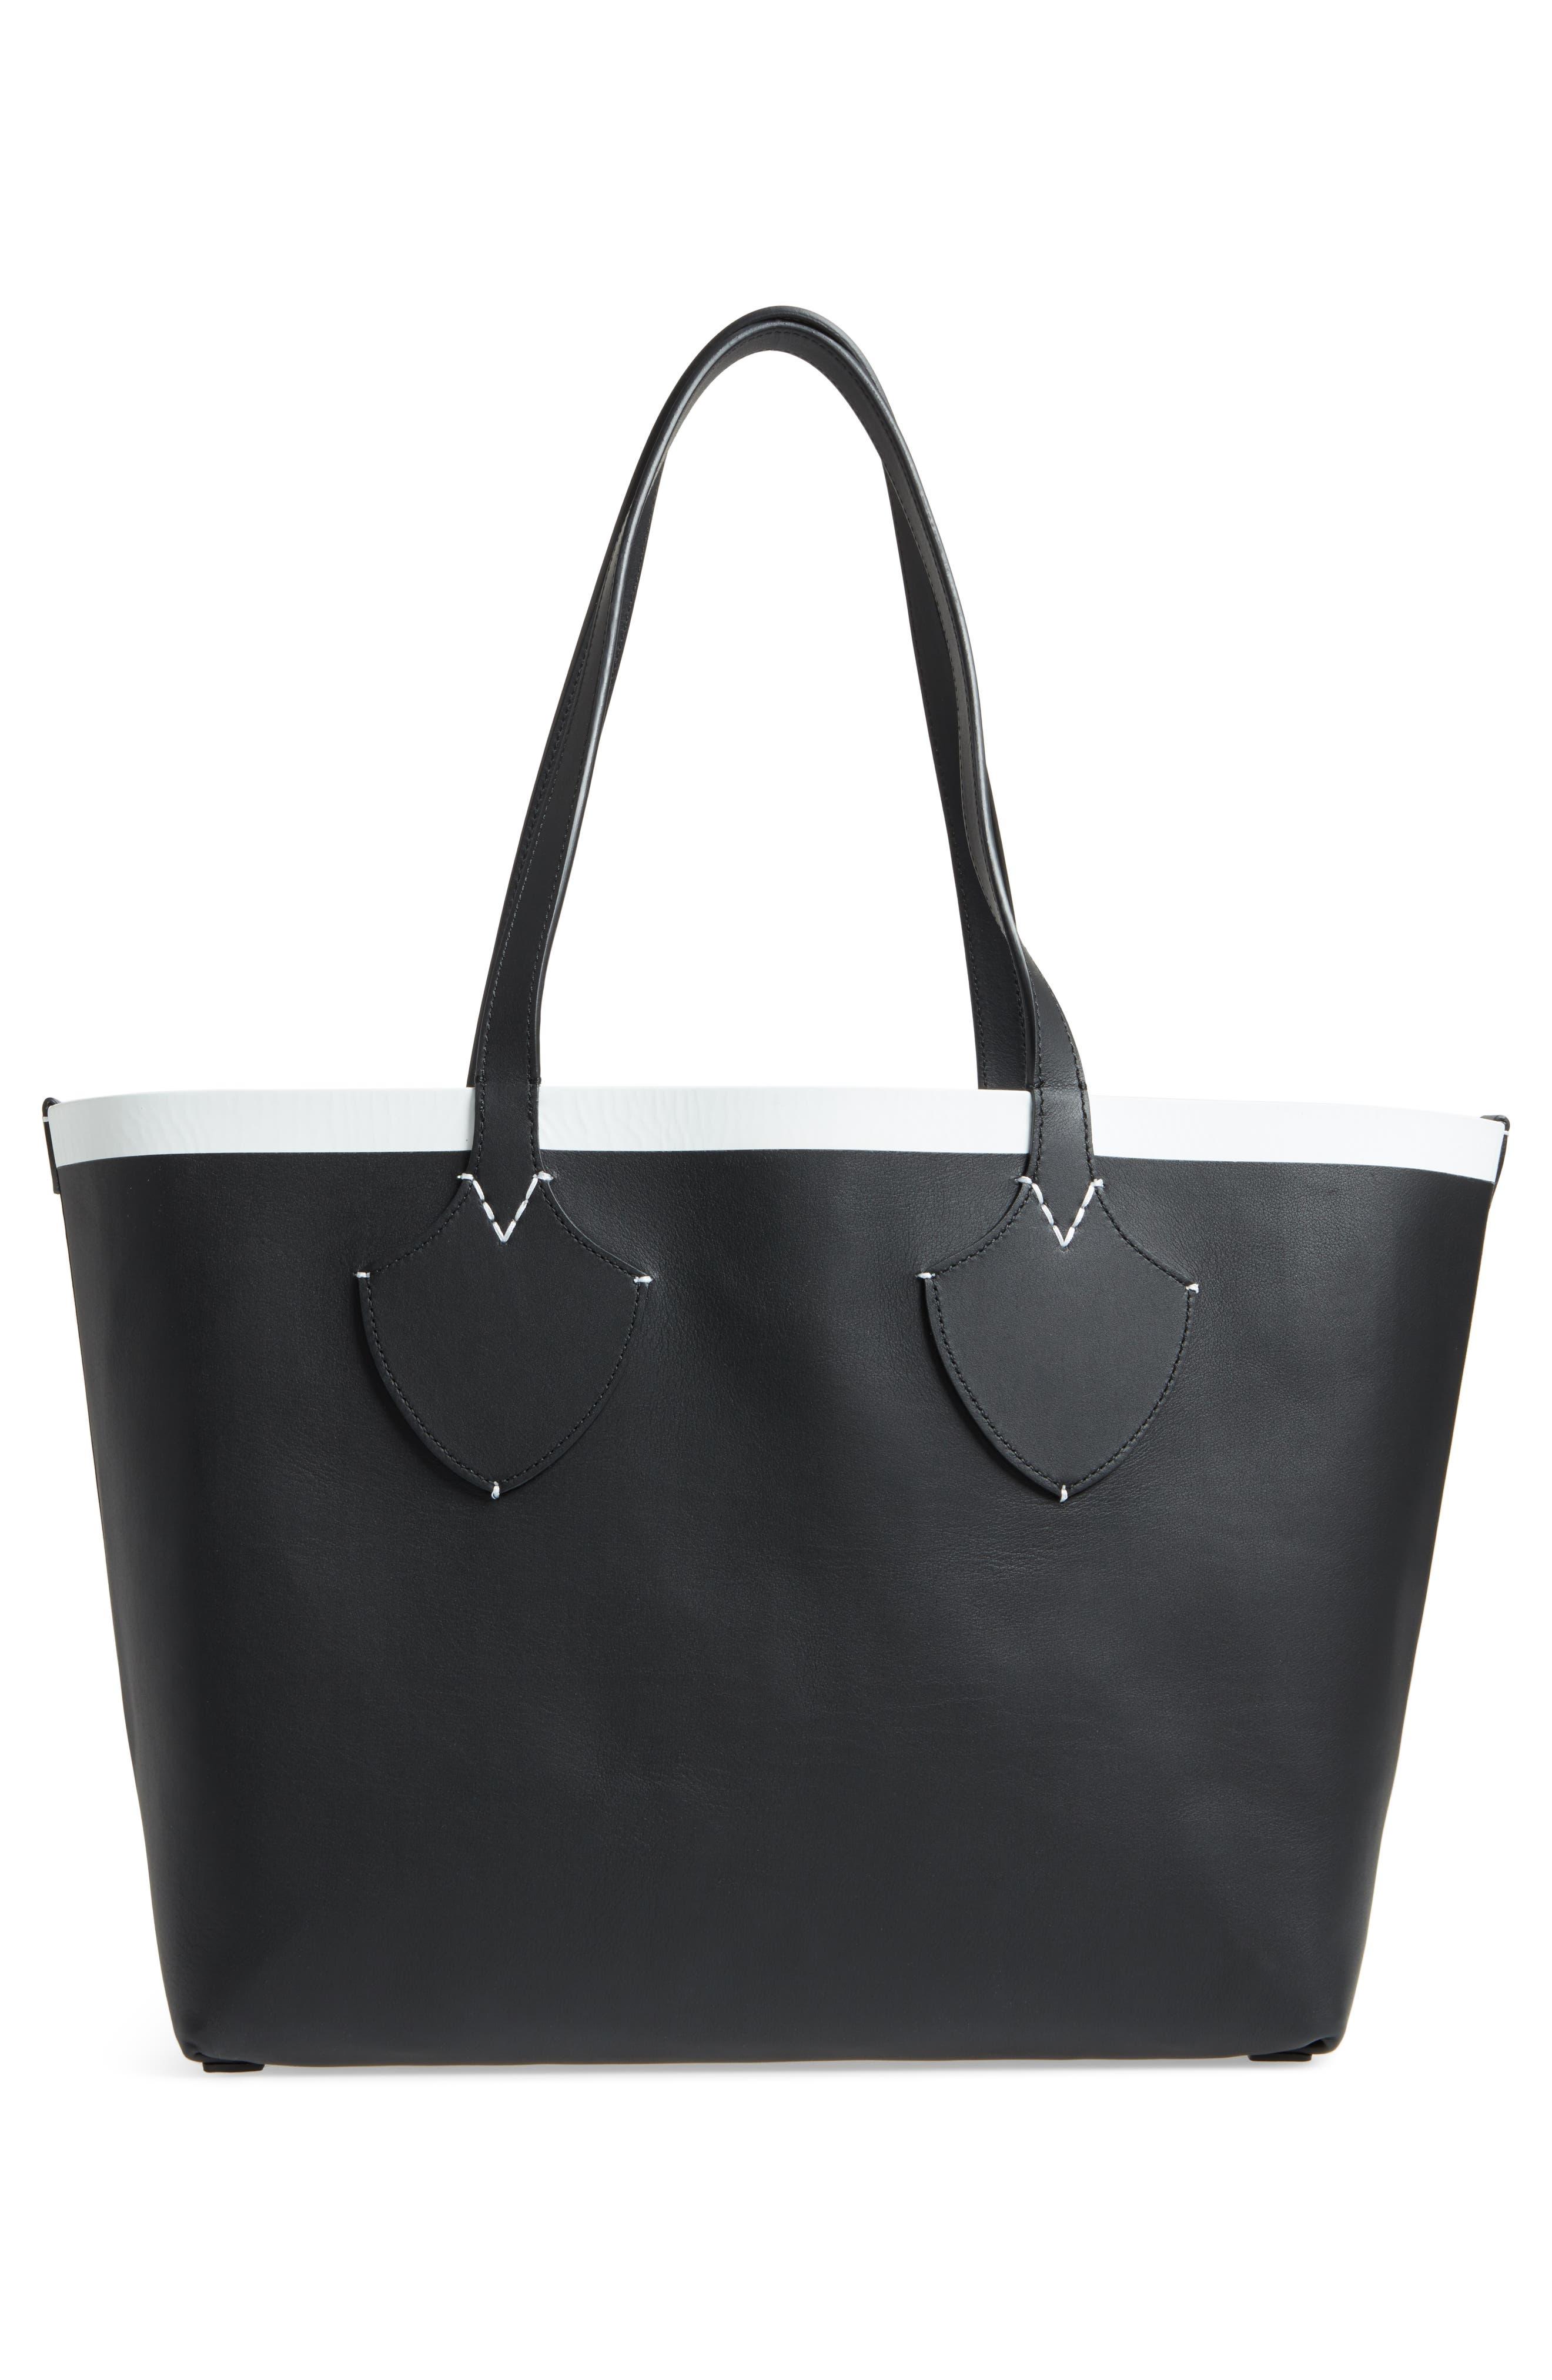 Medium Reversible Leather & Check Canvas Tote,                             Alternate thumbnail 4, color,                             BLACK/ WHITE